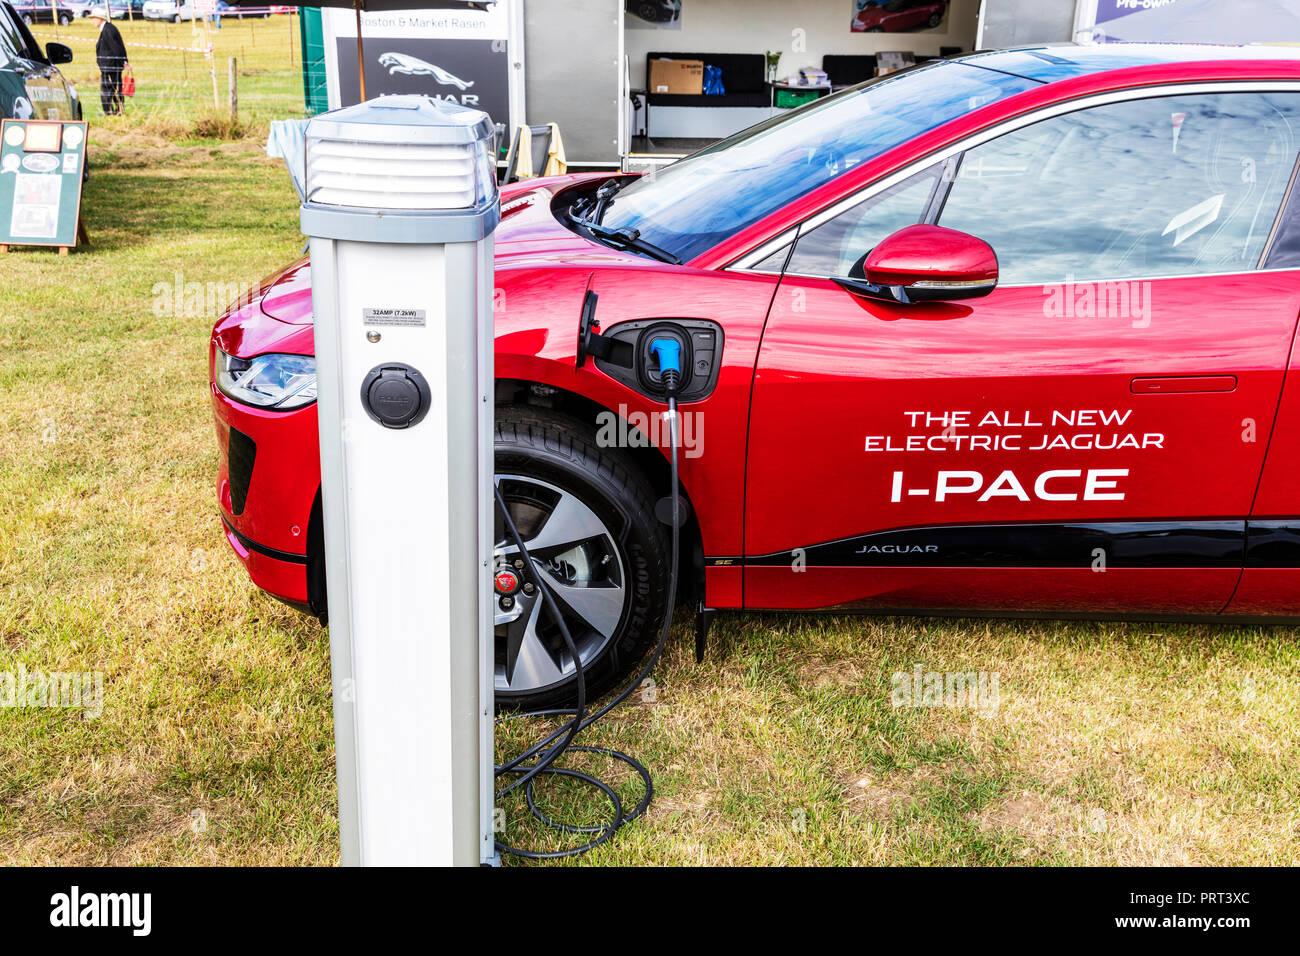 Jaguar i-pace car charging, Jaguar i-pace car, Jaguar i-pace, charging, Electric car, charging car point, car charging point, I-pace jaguar, - Stock Image